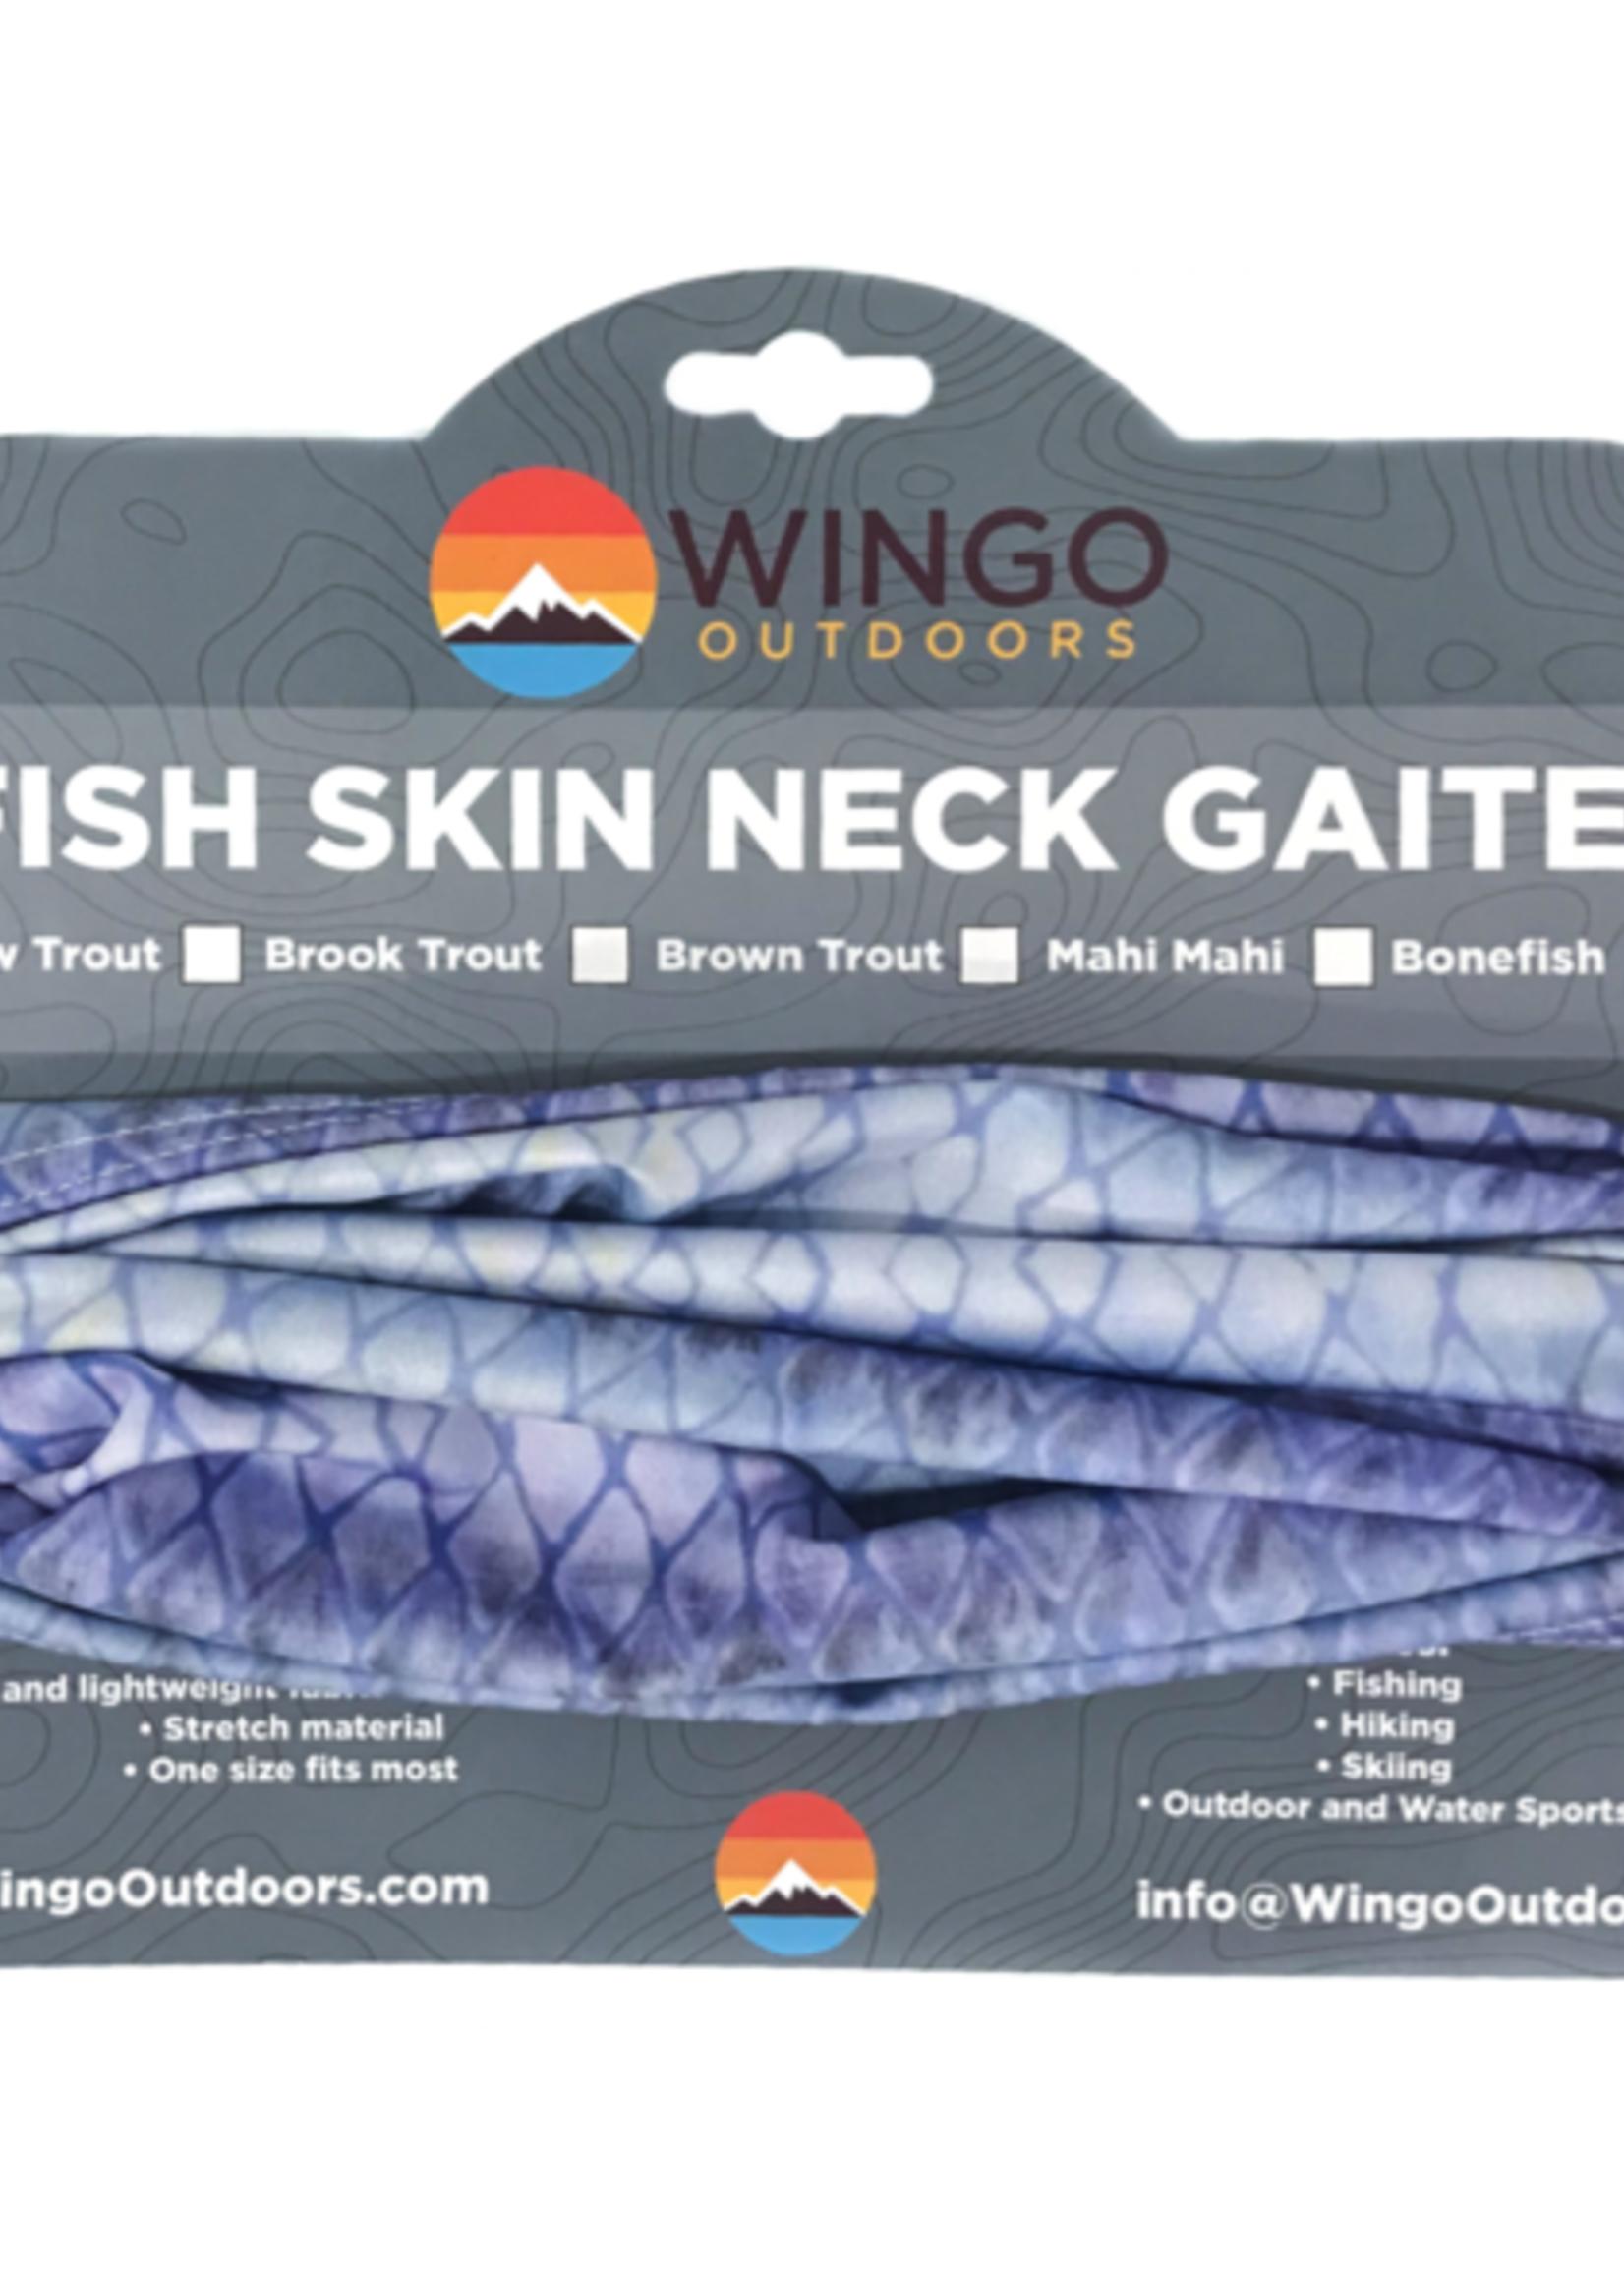 WINGO OUTDOORS WINGO FISH SKIN NECK GAITER